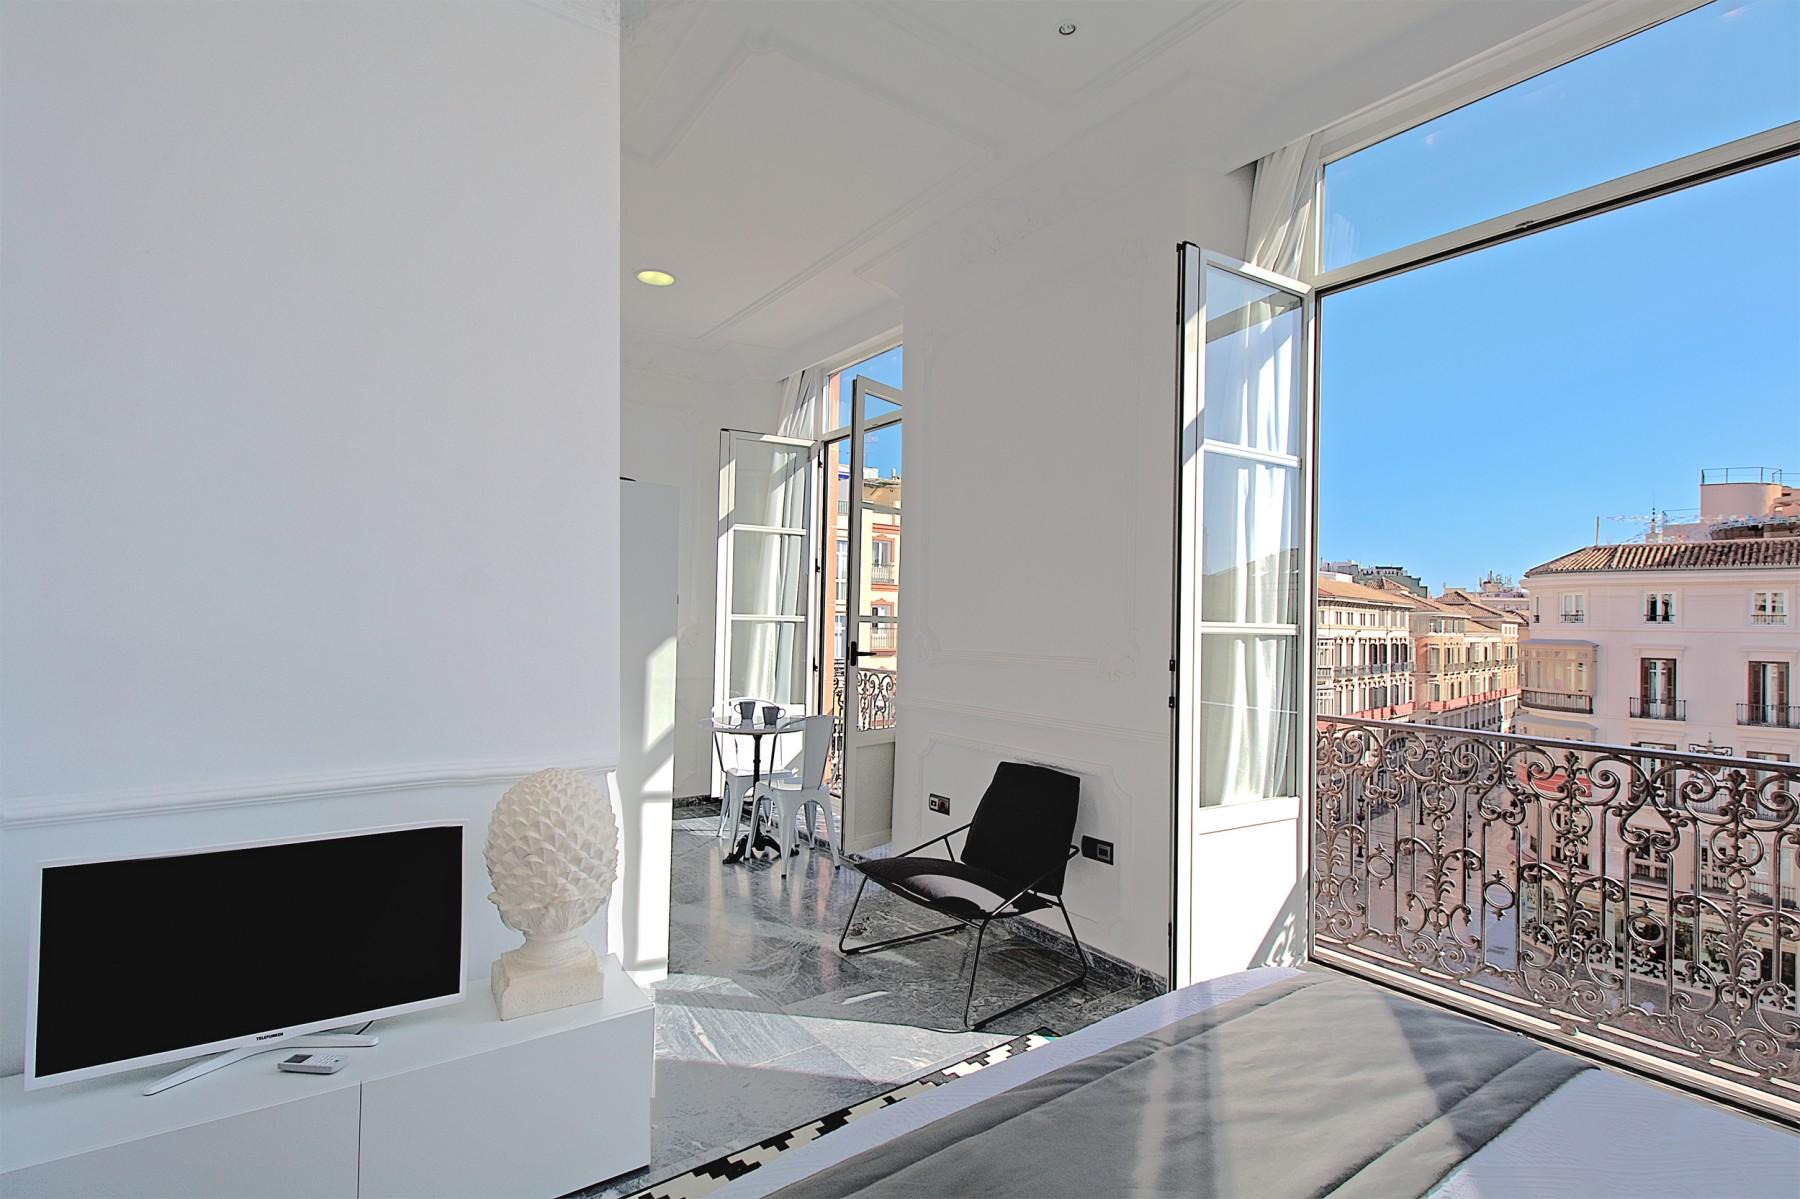 Apartamentos en m laga constituci n i for Alojamiento estancia 25m2